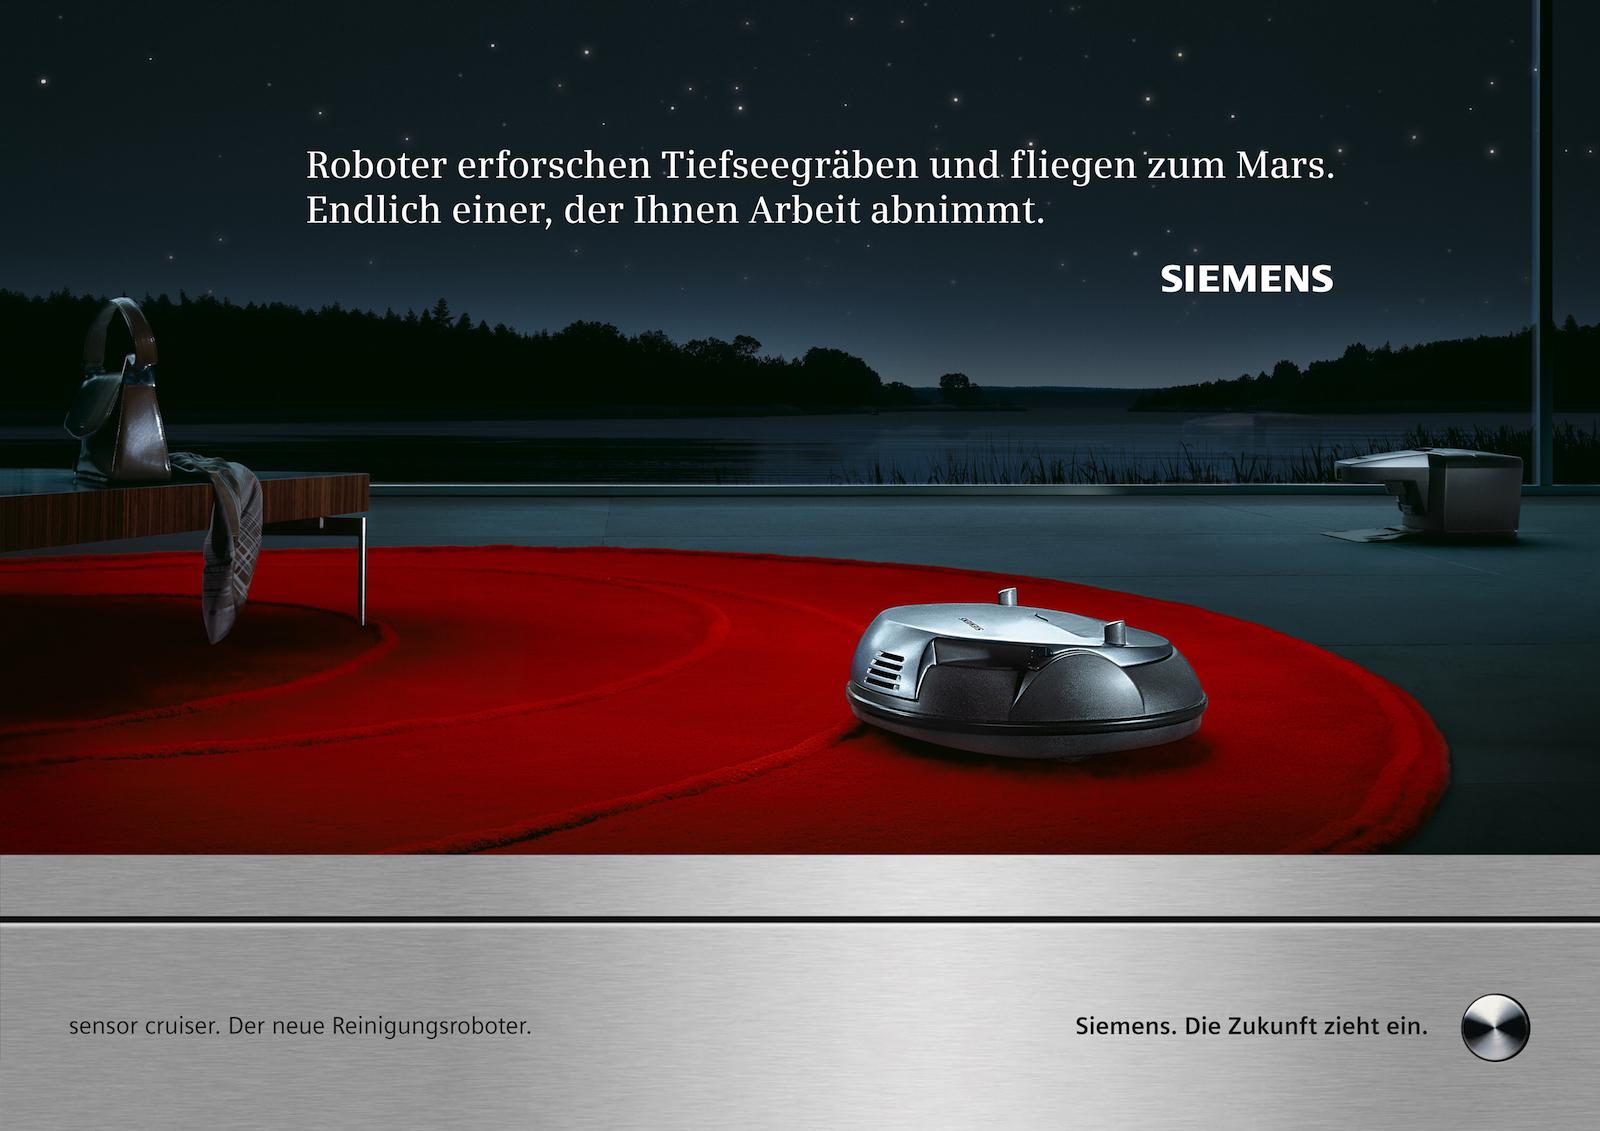 Siemens-sensor-cruiser